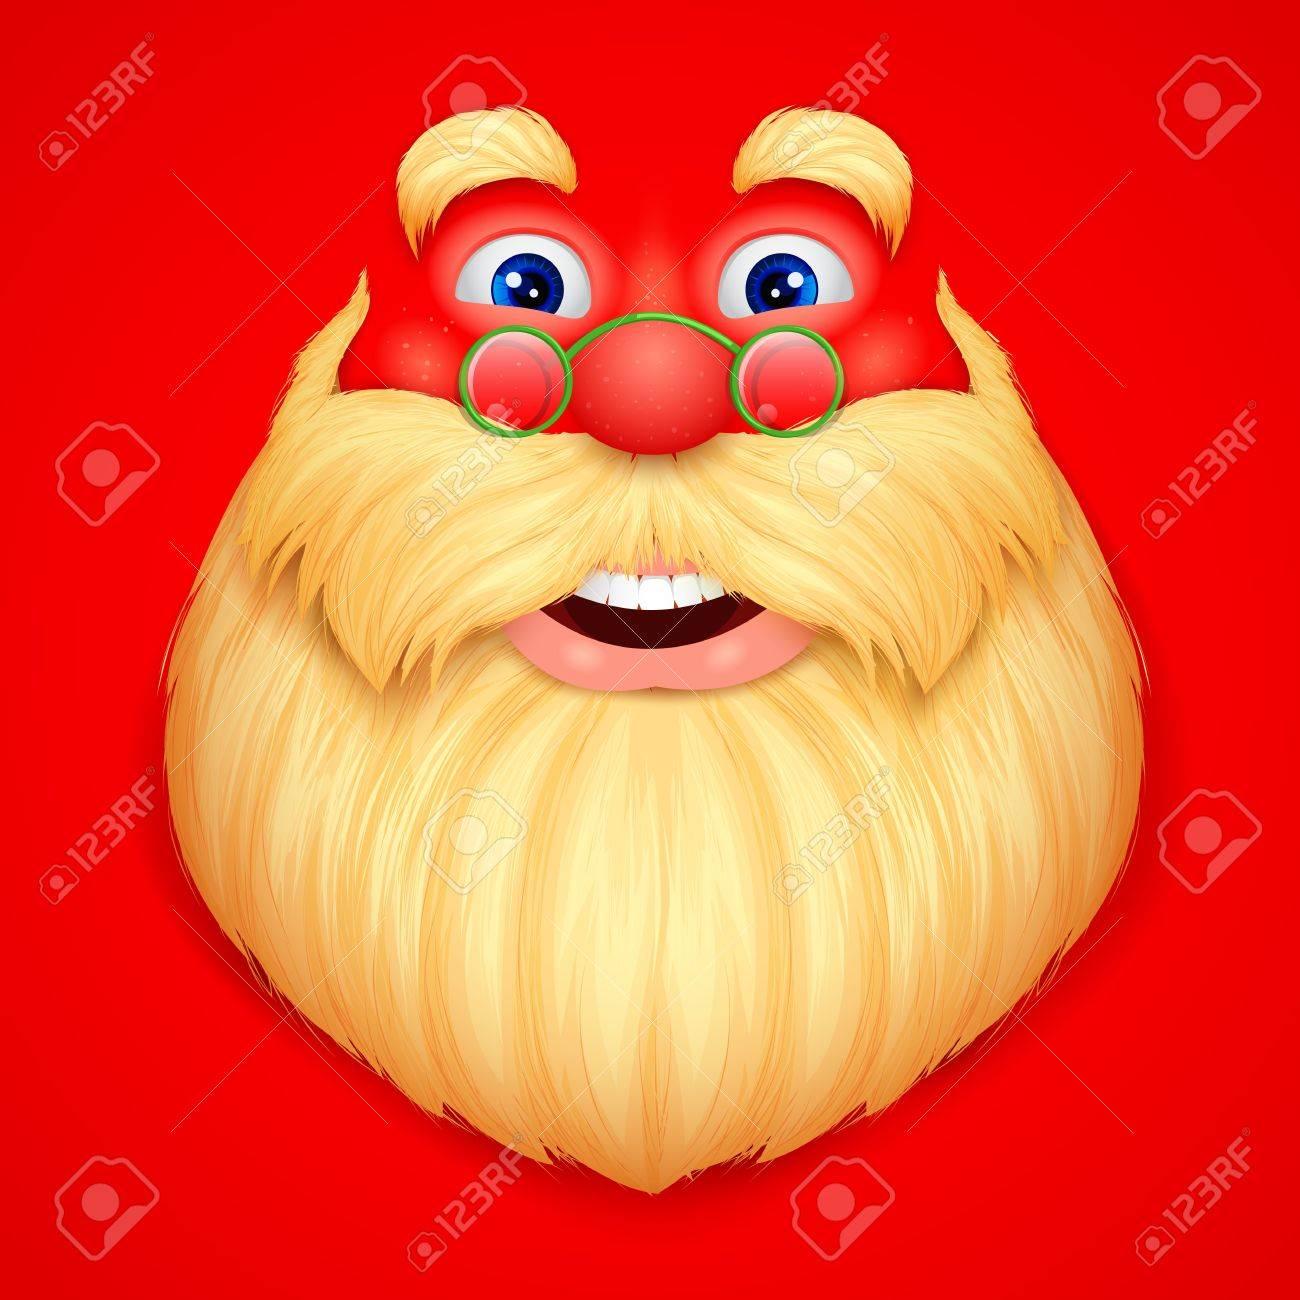 illustration of face Santa Claus singing ho ho ho wishing Merry Christmas Stock Vector - 17062236